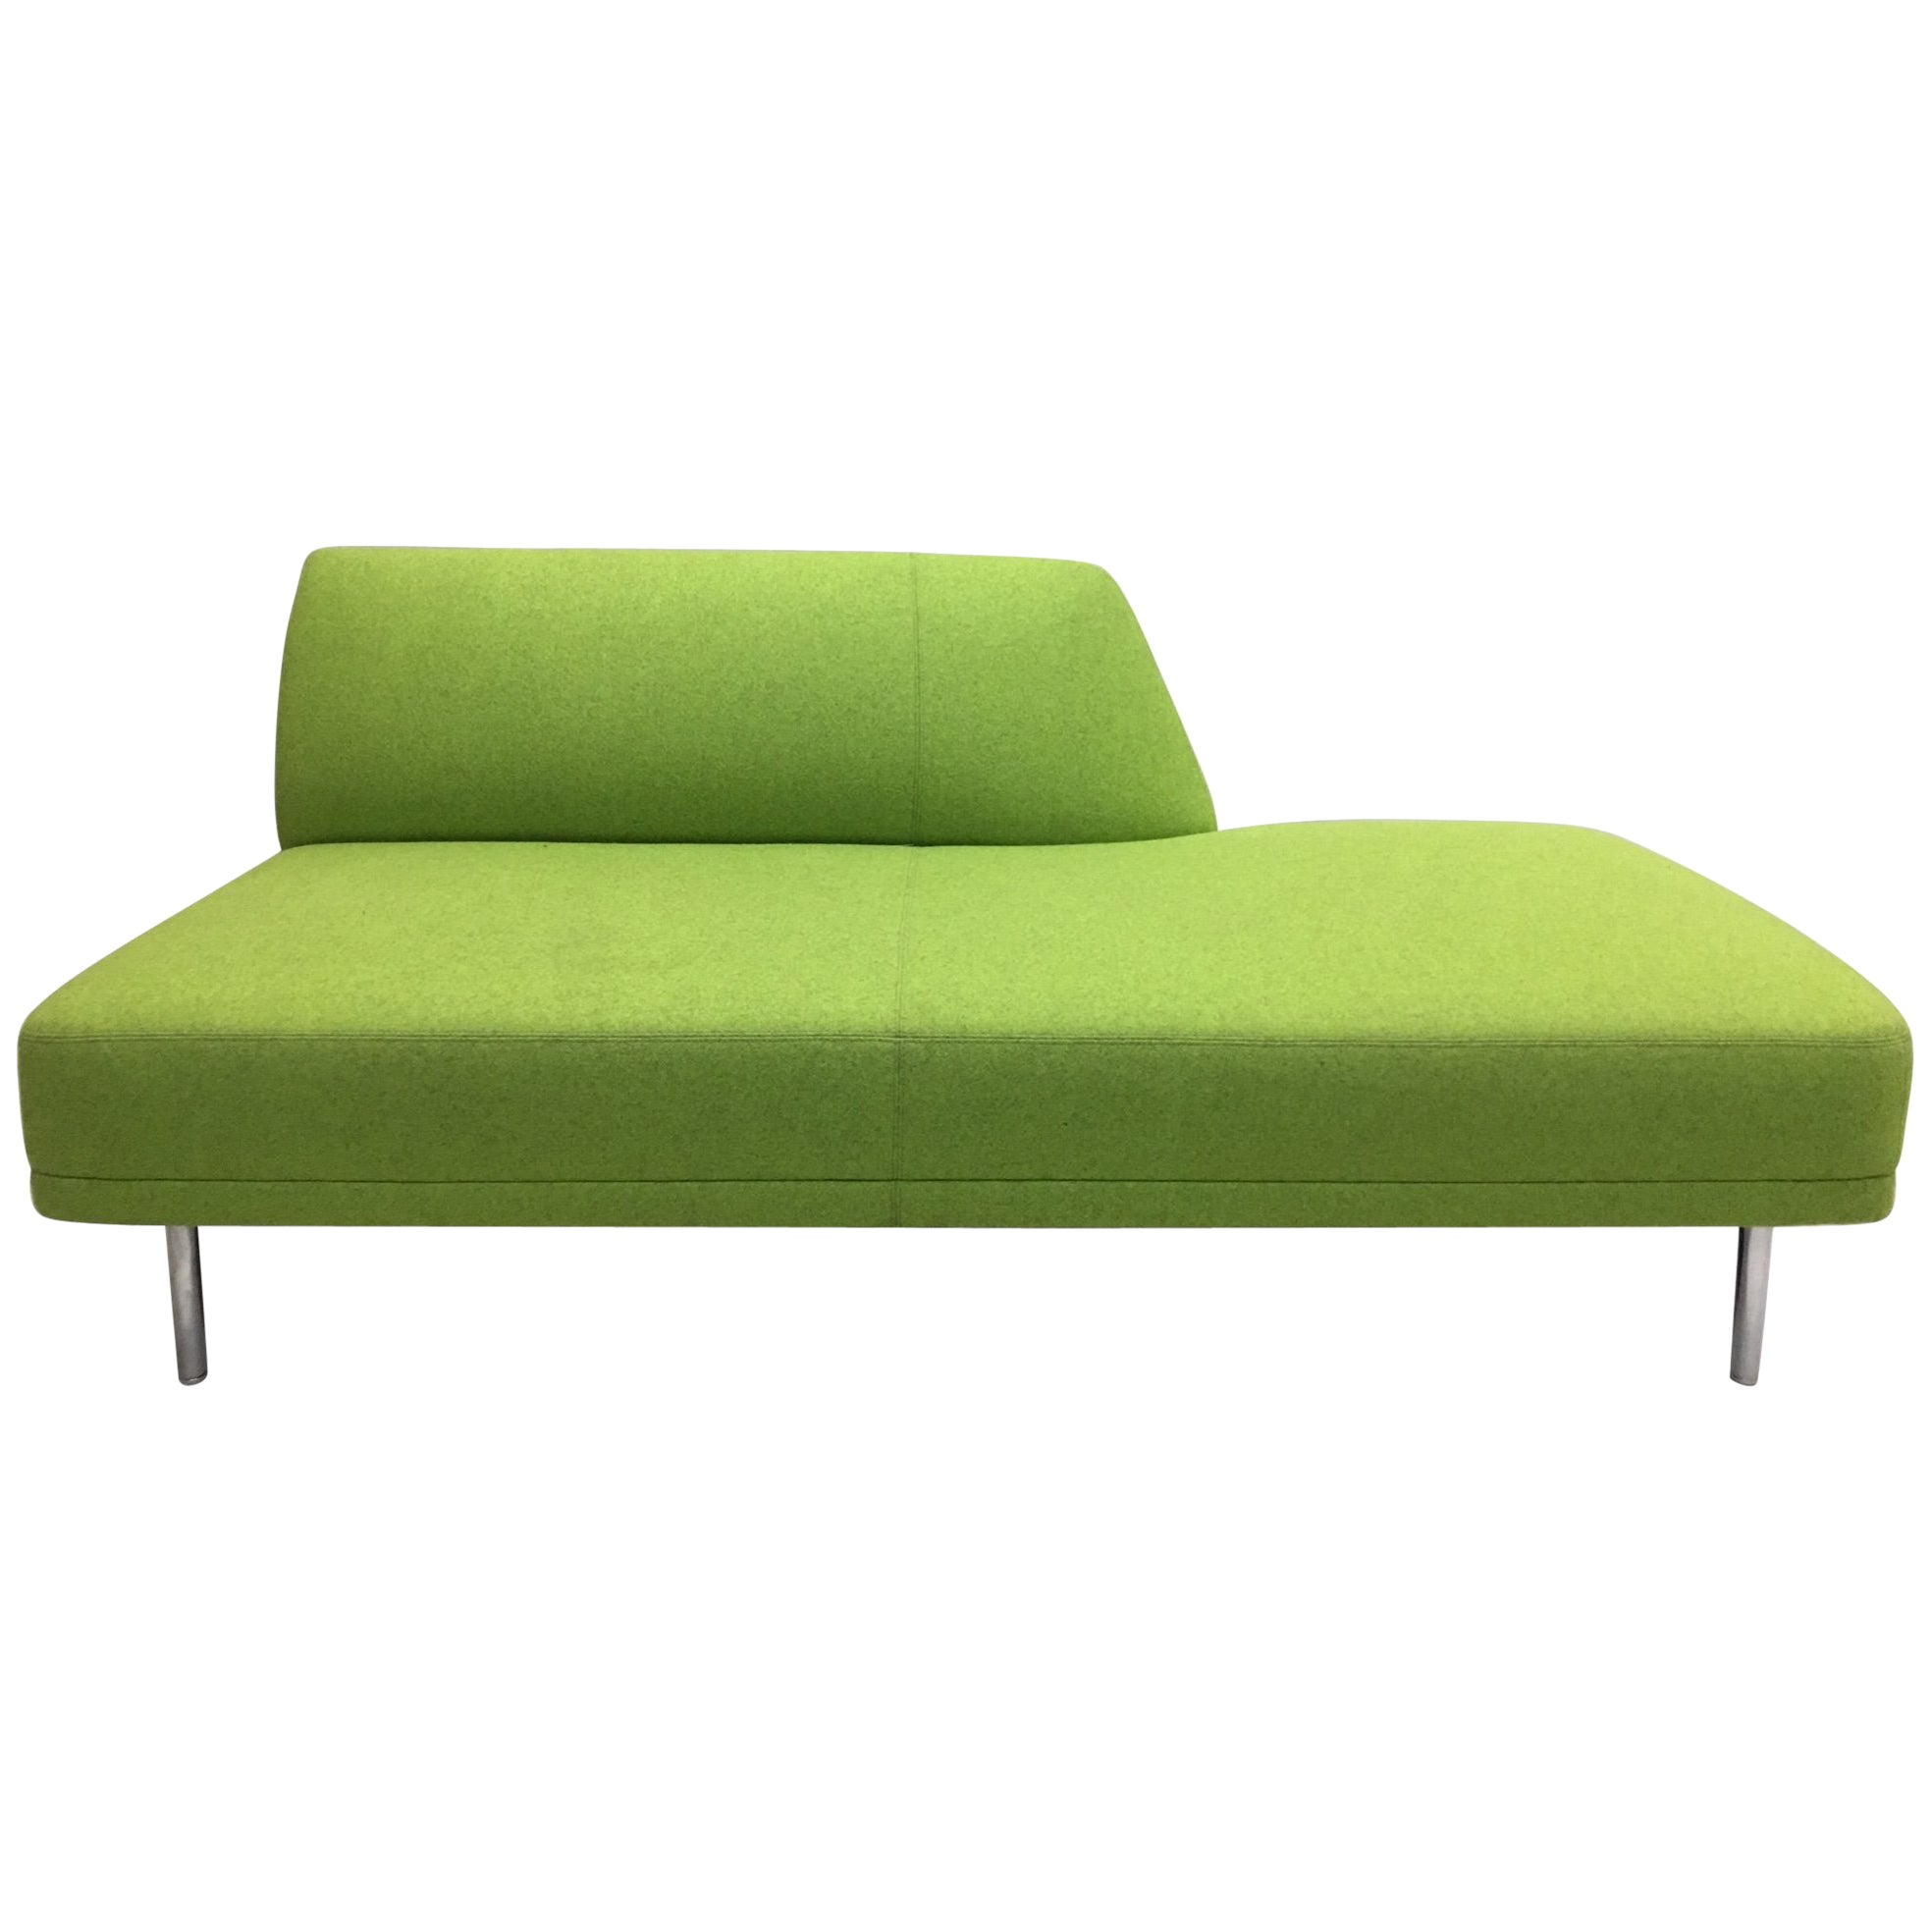 Italian Design Mid-Century Modern Style Moss Green Sofa, Love Seat and Bench